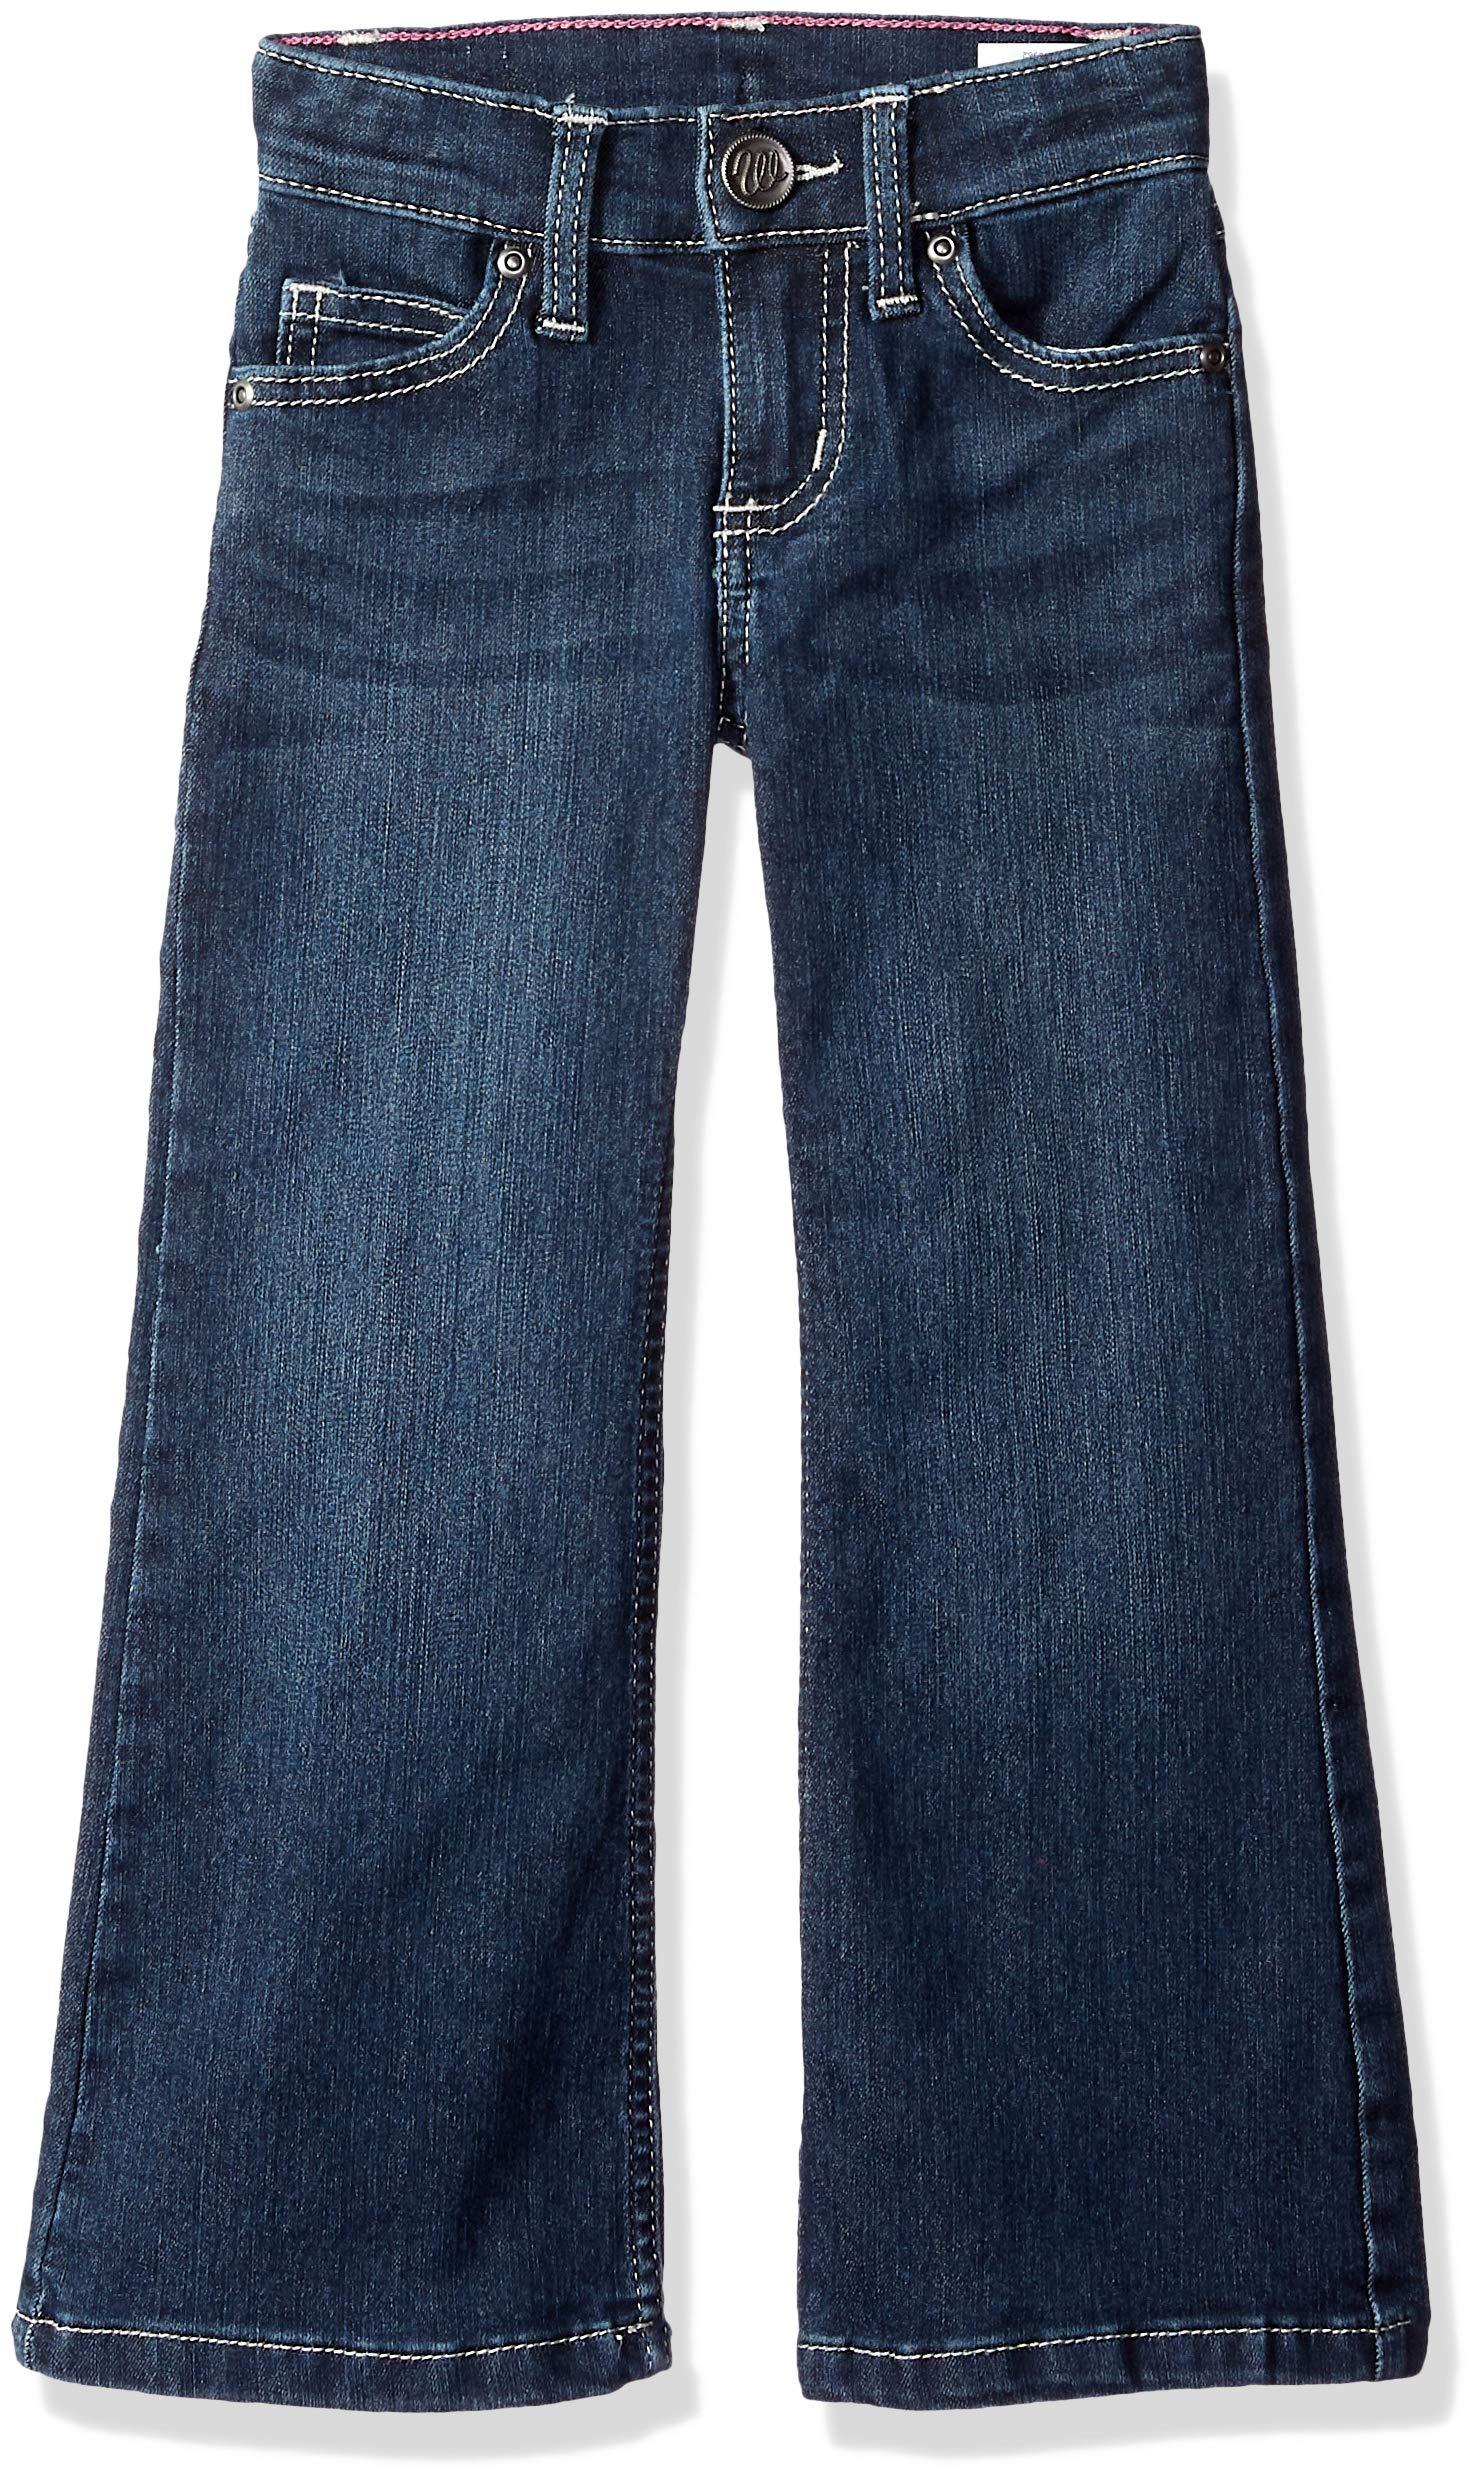 Wrangler Girls' Big Retro Stretch Boot Cut Jean, Dark Blue, 8 Slim